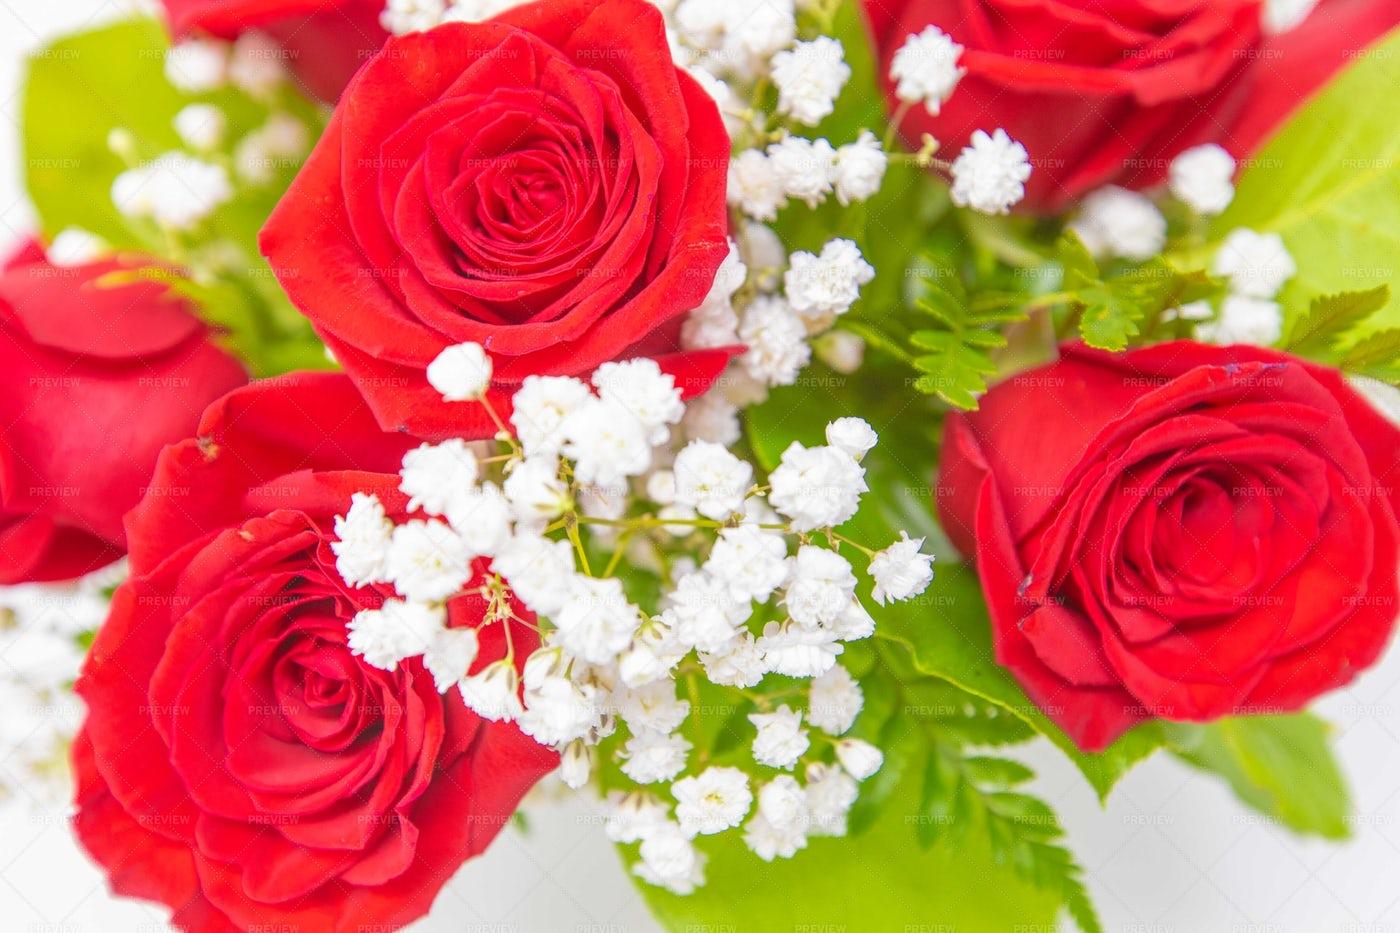 Valentine's Day Roses: Stock Photos